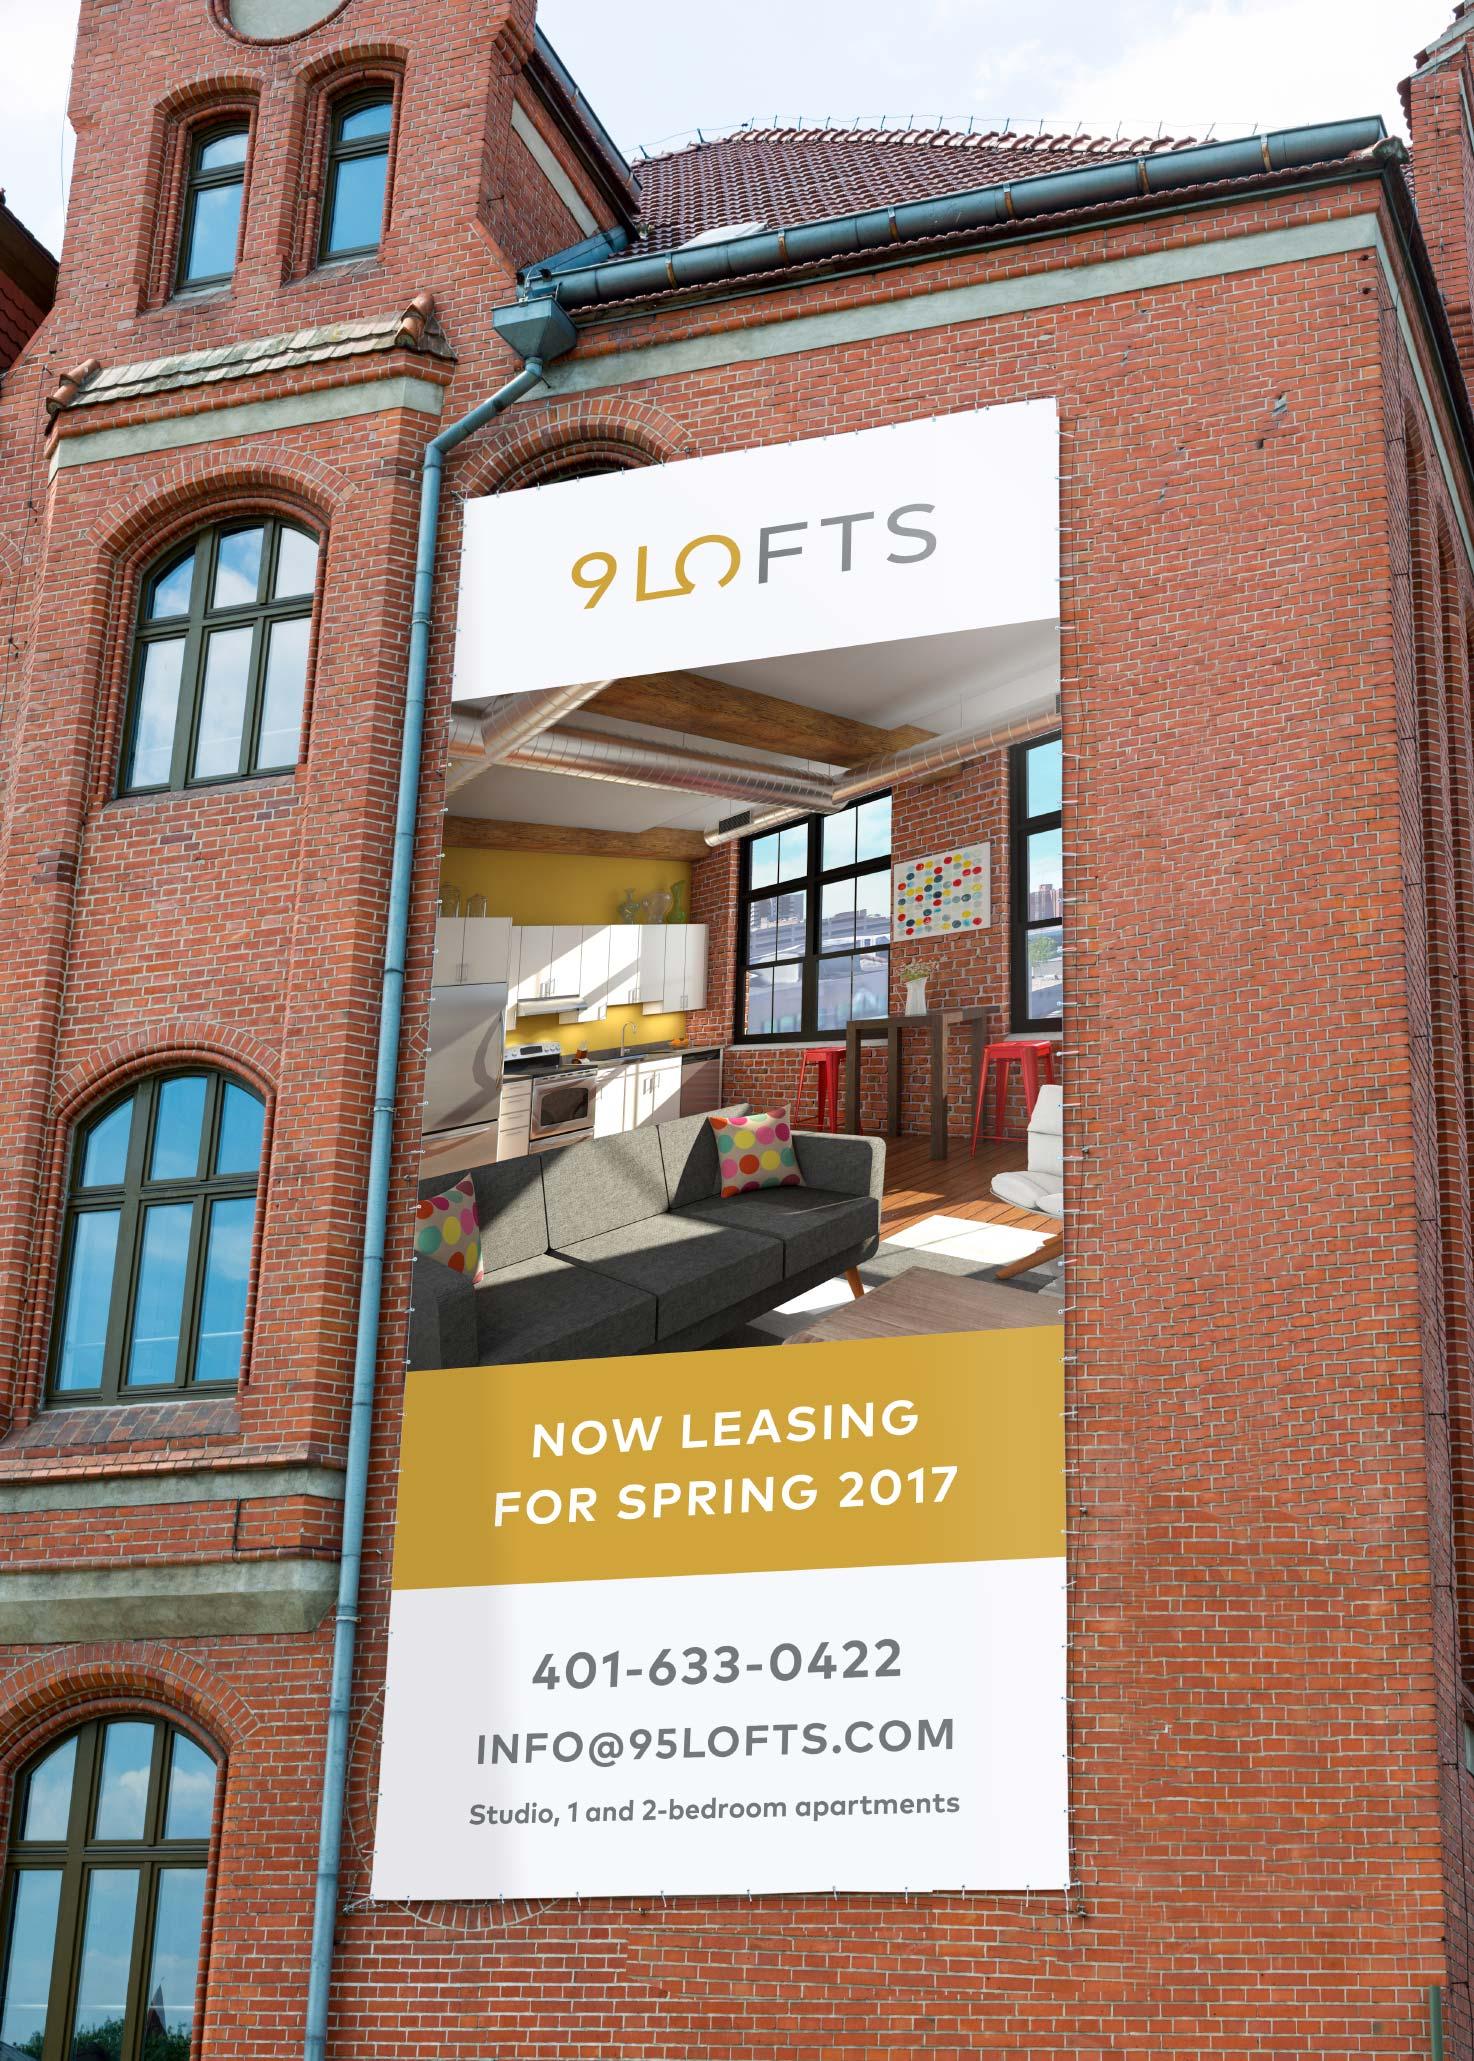 95 Lofts outdoor vinyl signage